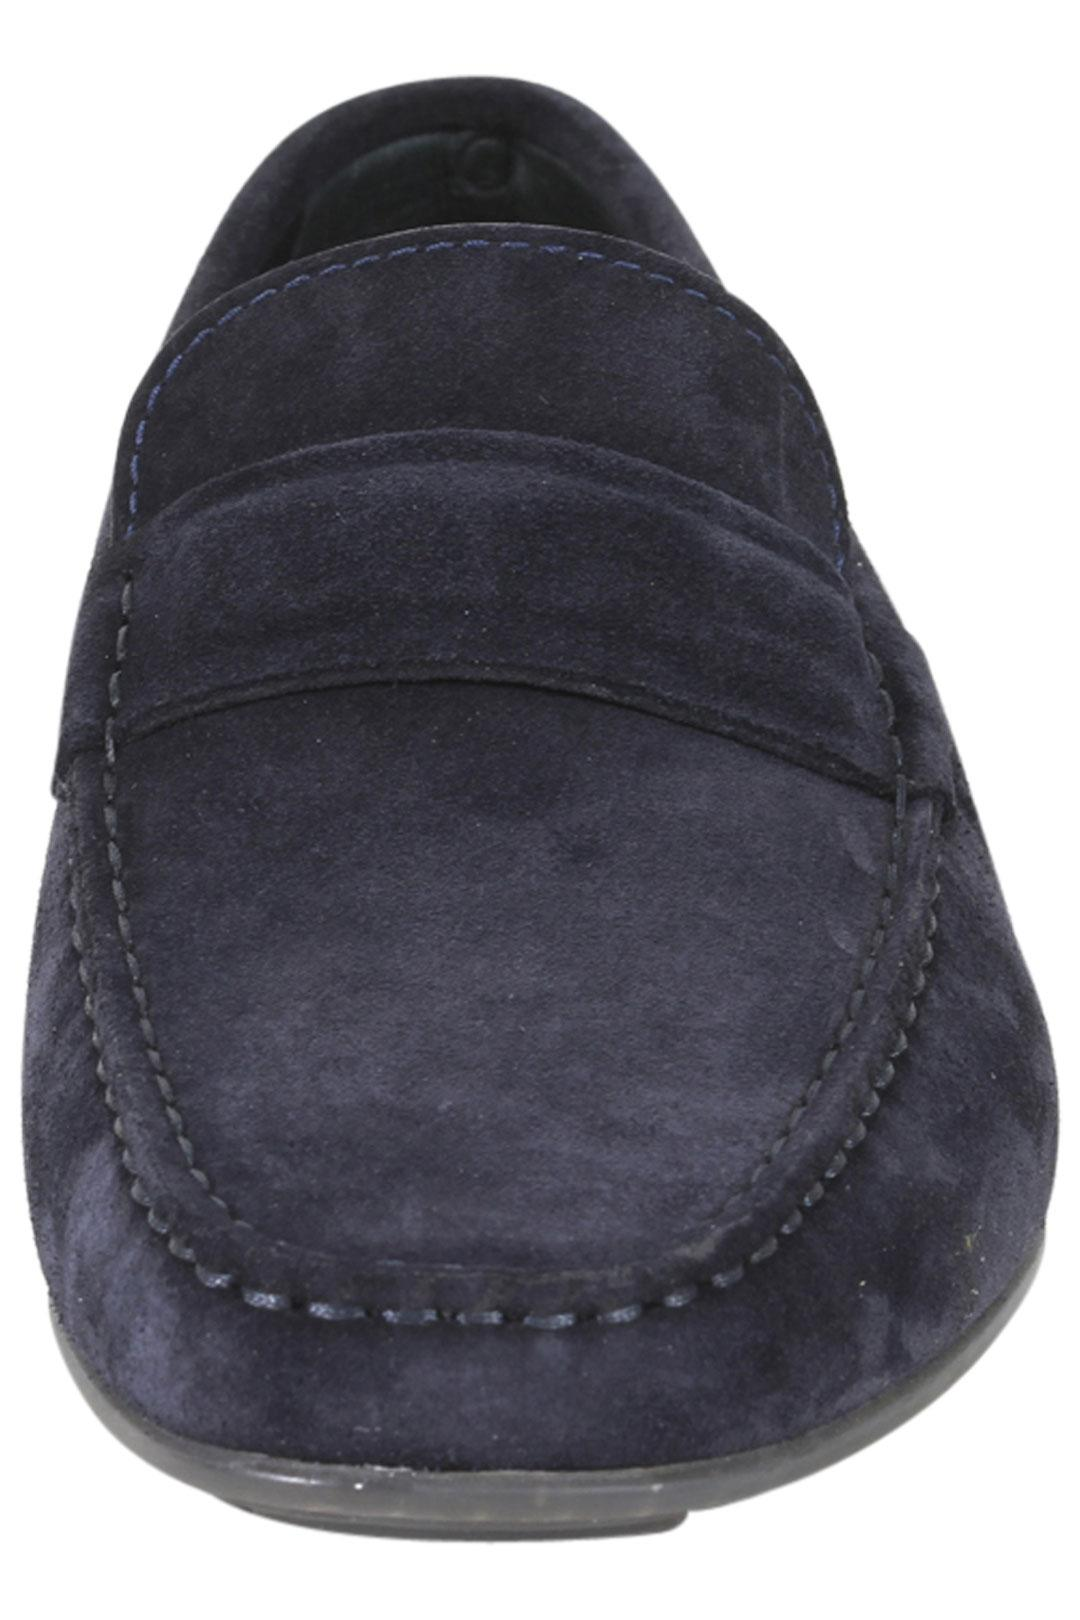 81c06137ce8 Hugo Boss Men s Dandy Moccasins Loafers Shoes by Hugo Boss. 1234567